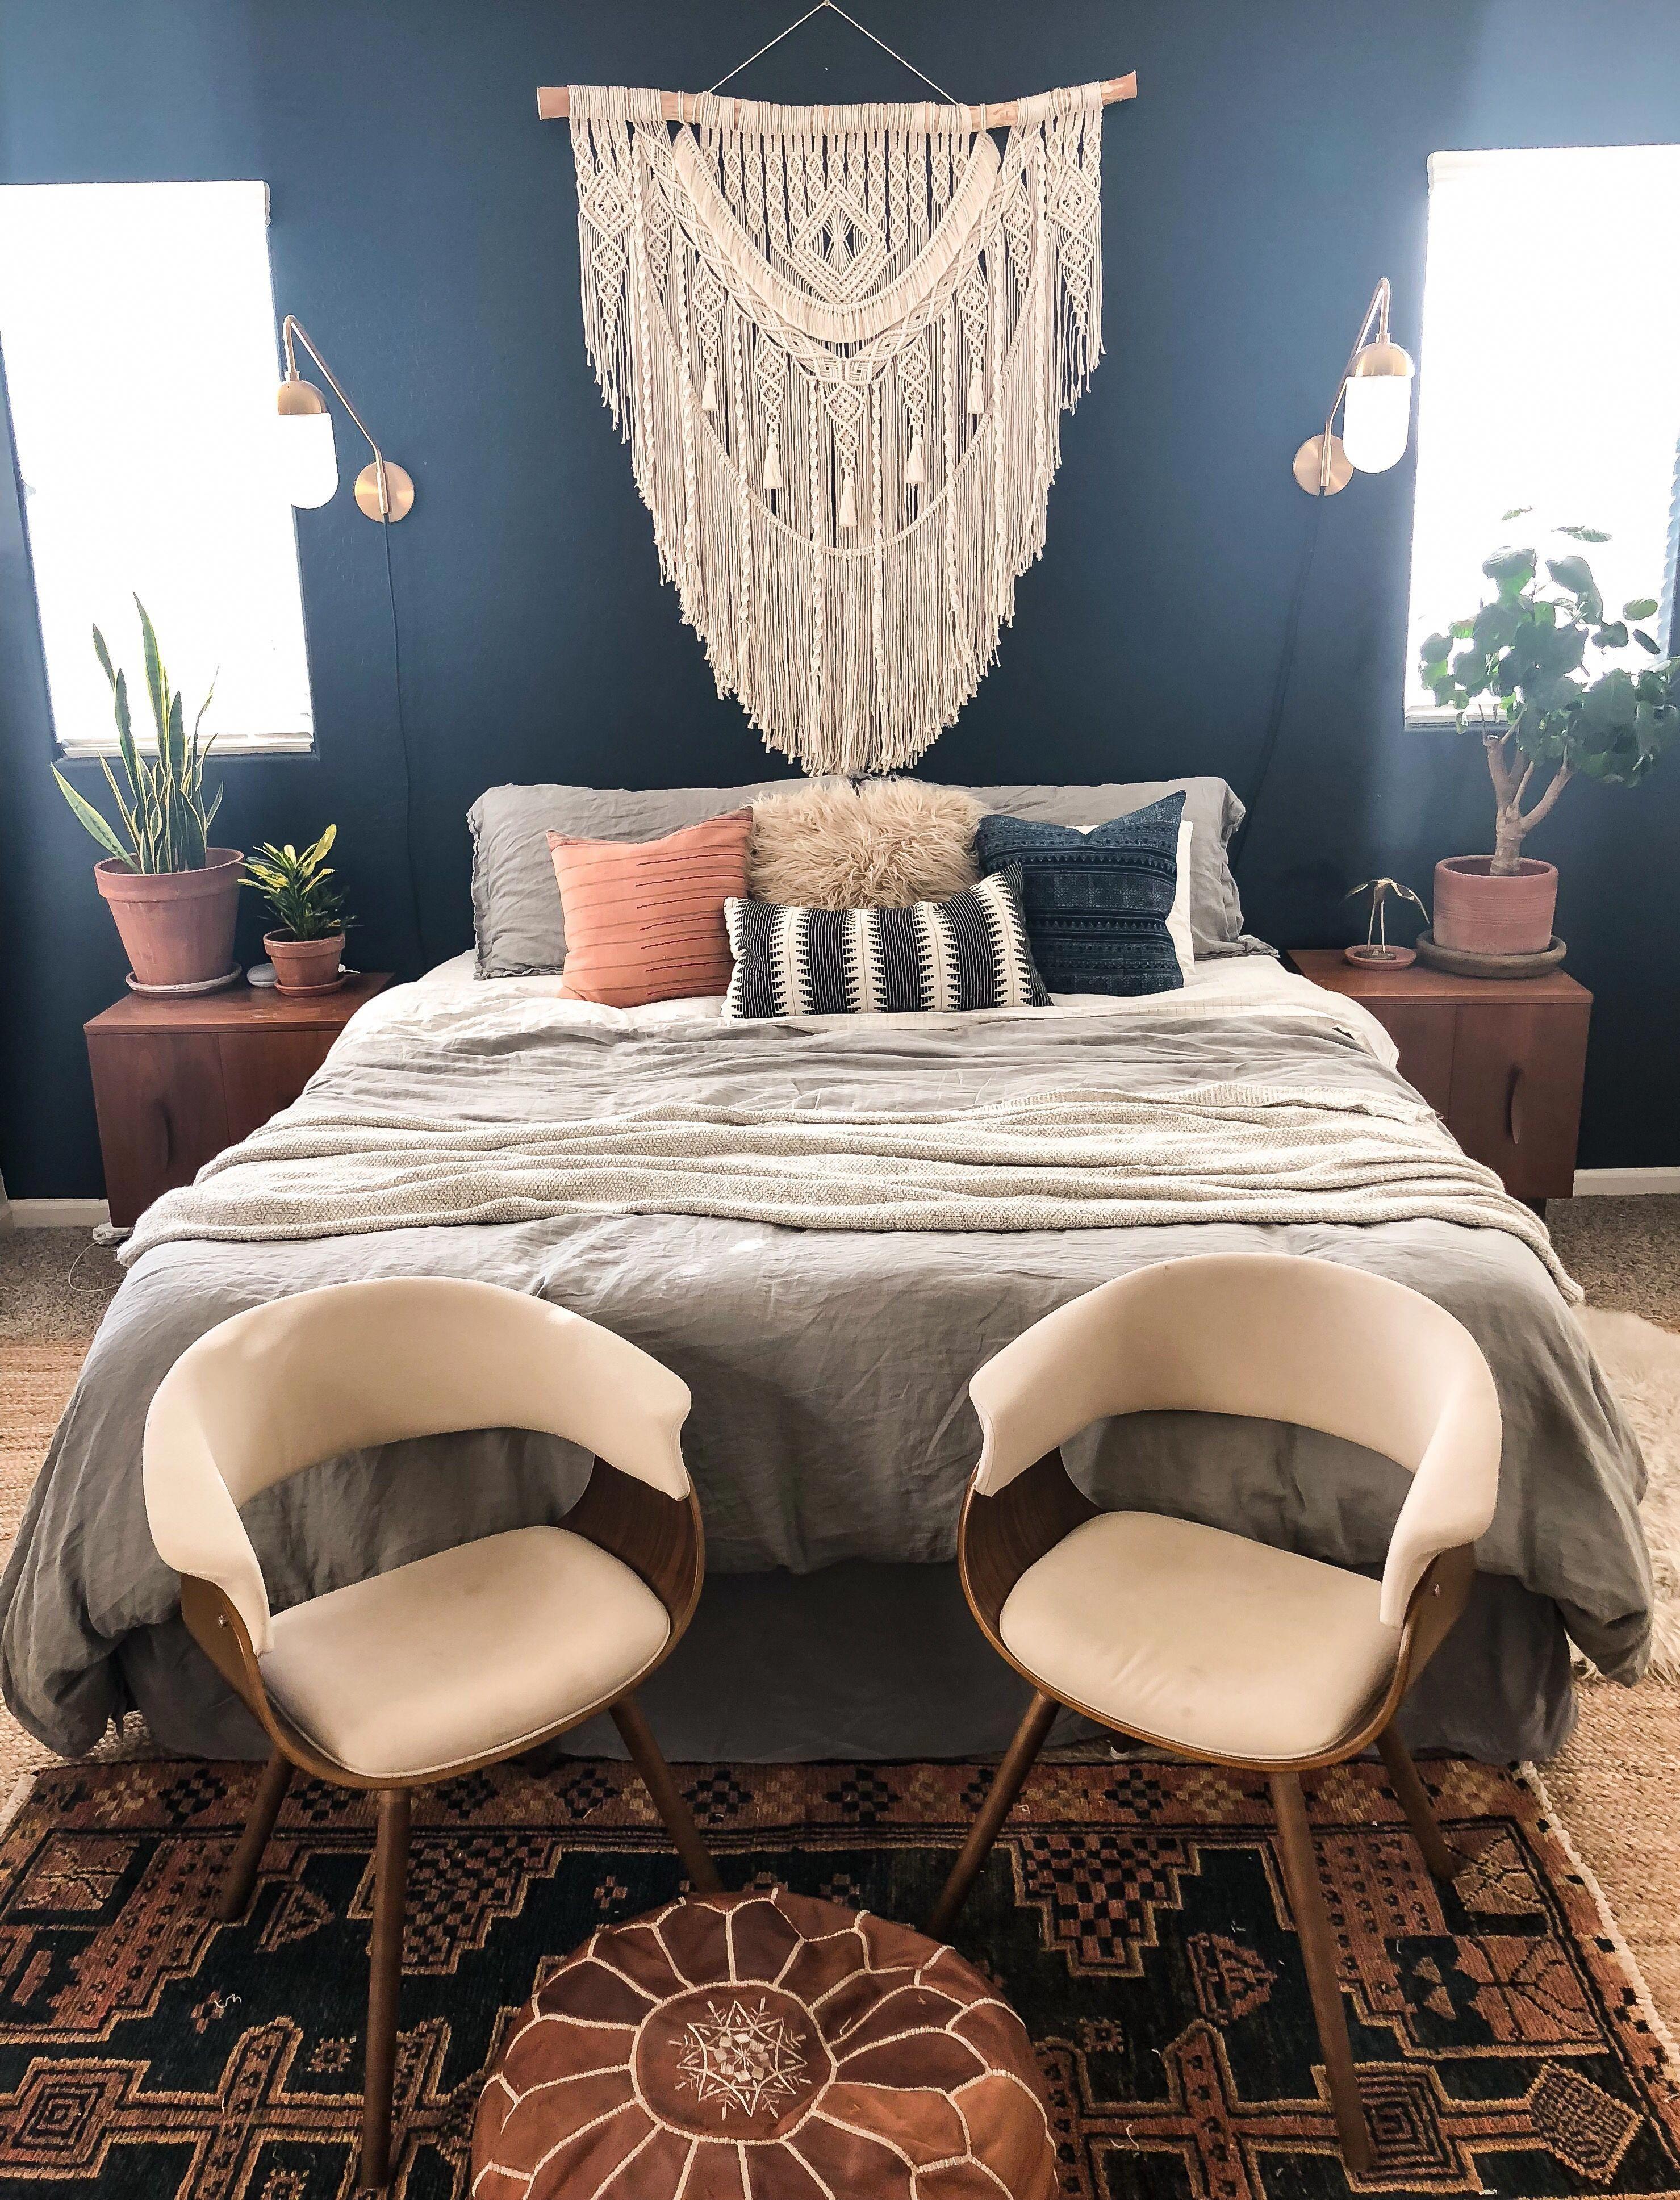 35 Amazingly Pretty Shabby Chic Bedroom Design And Decor Ideas Muebles De Esquina Decoracion Hogar Decoracion De Interiores